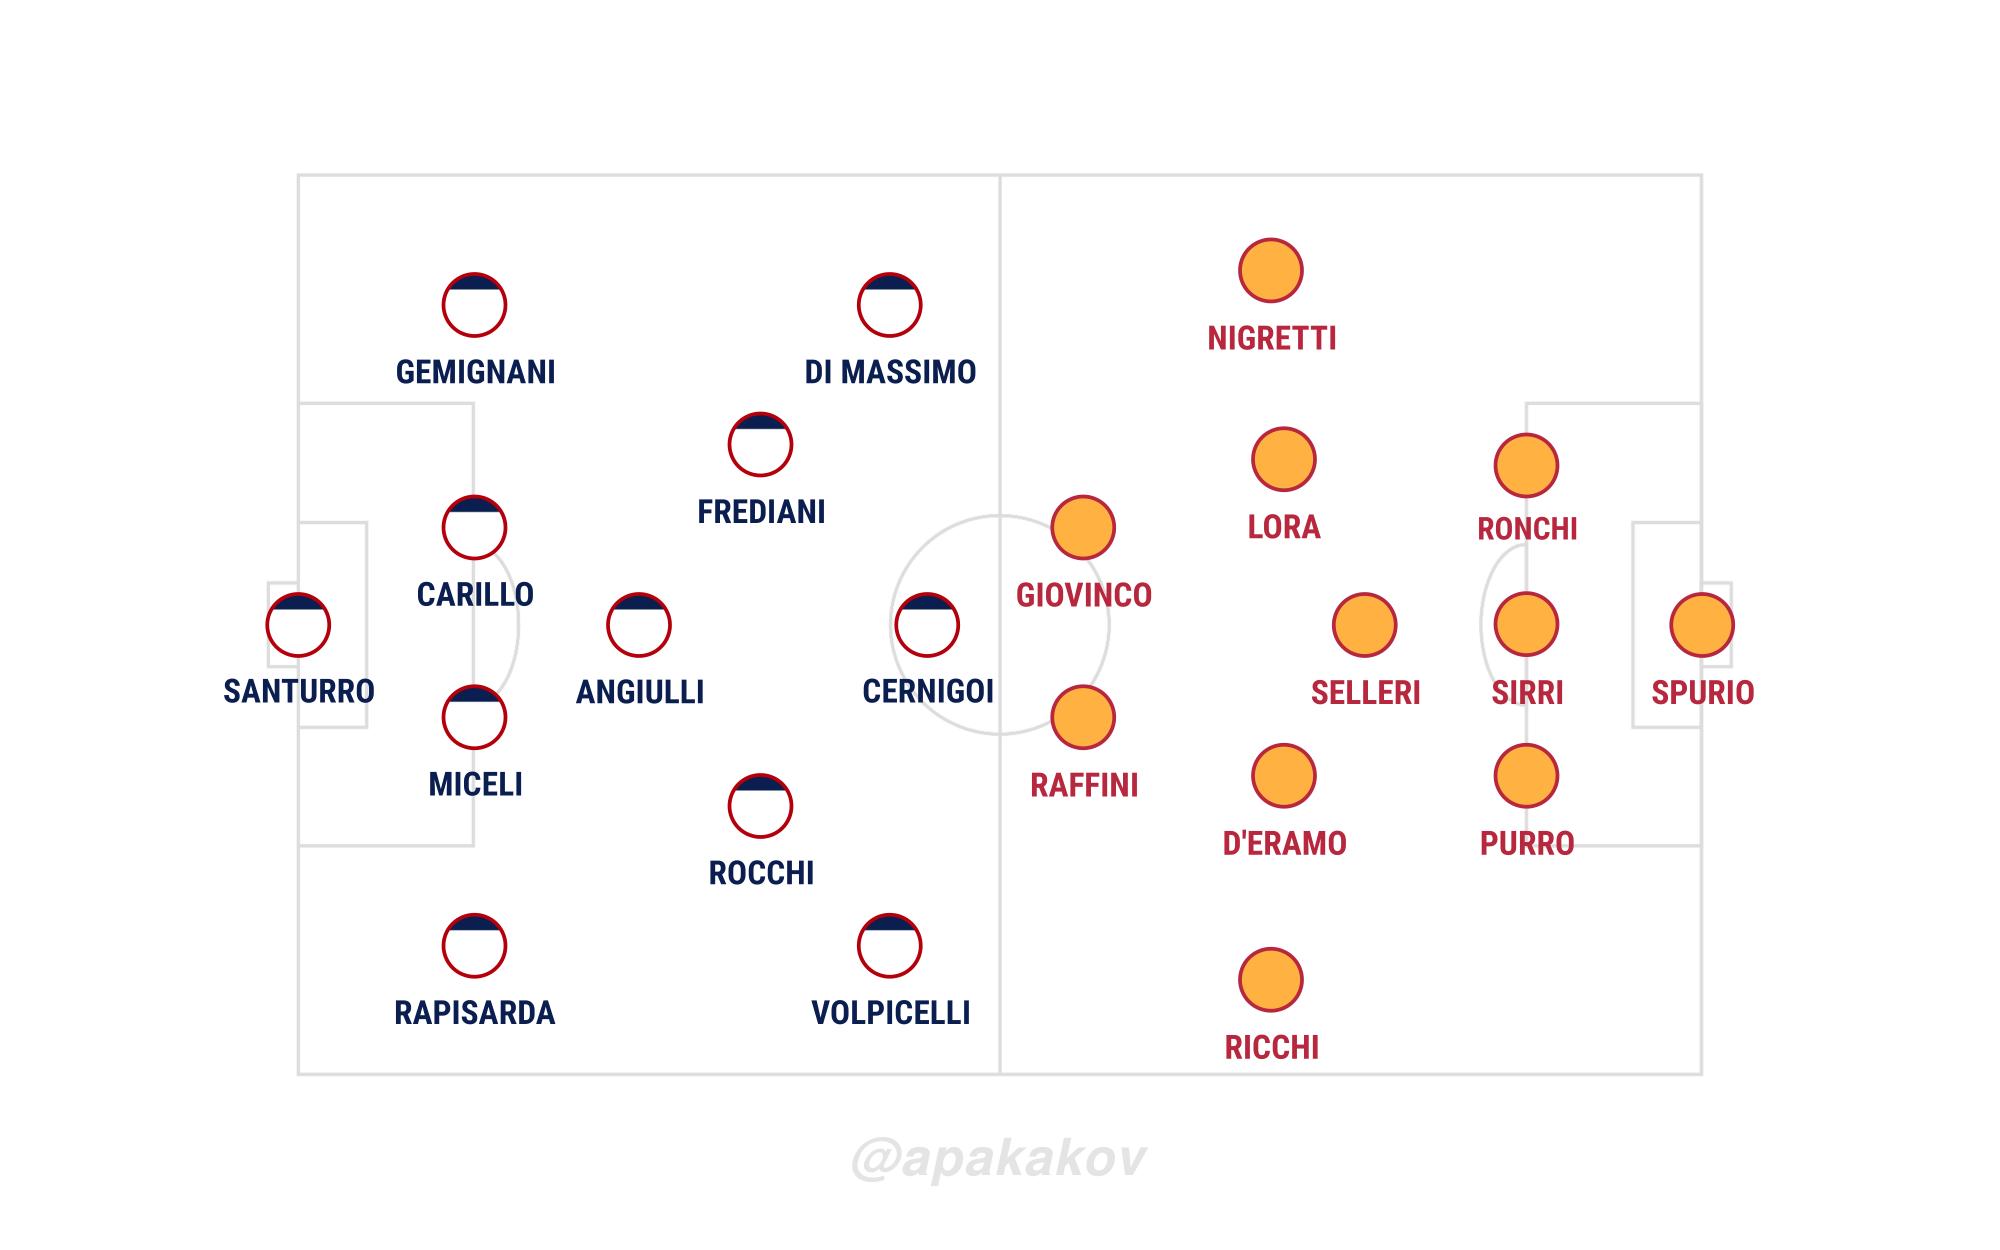 Ravenna-Samb 0-2